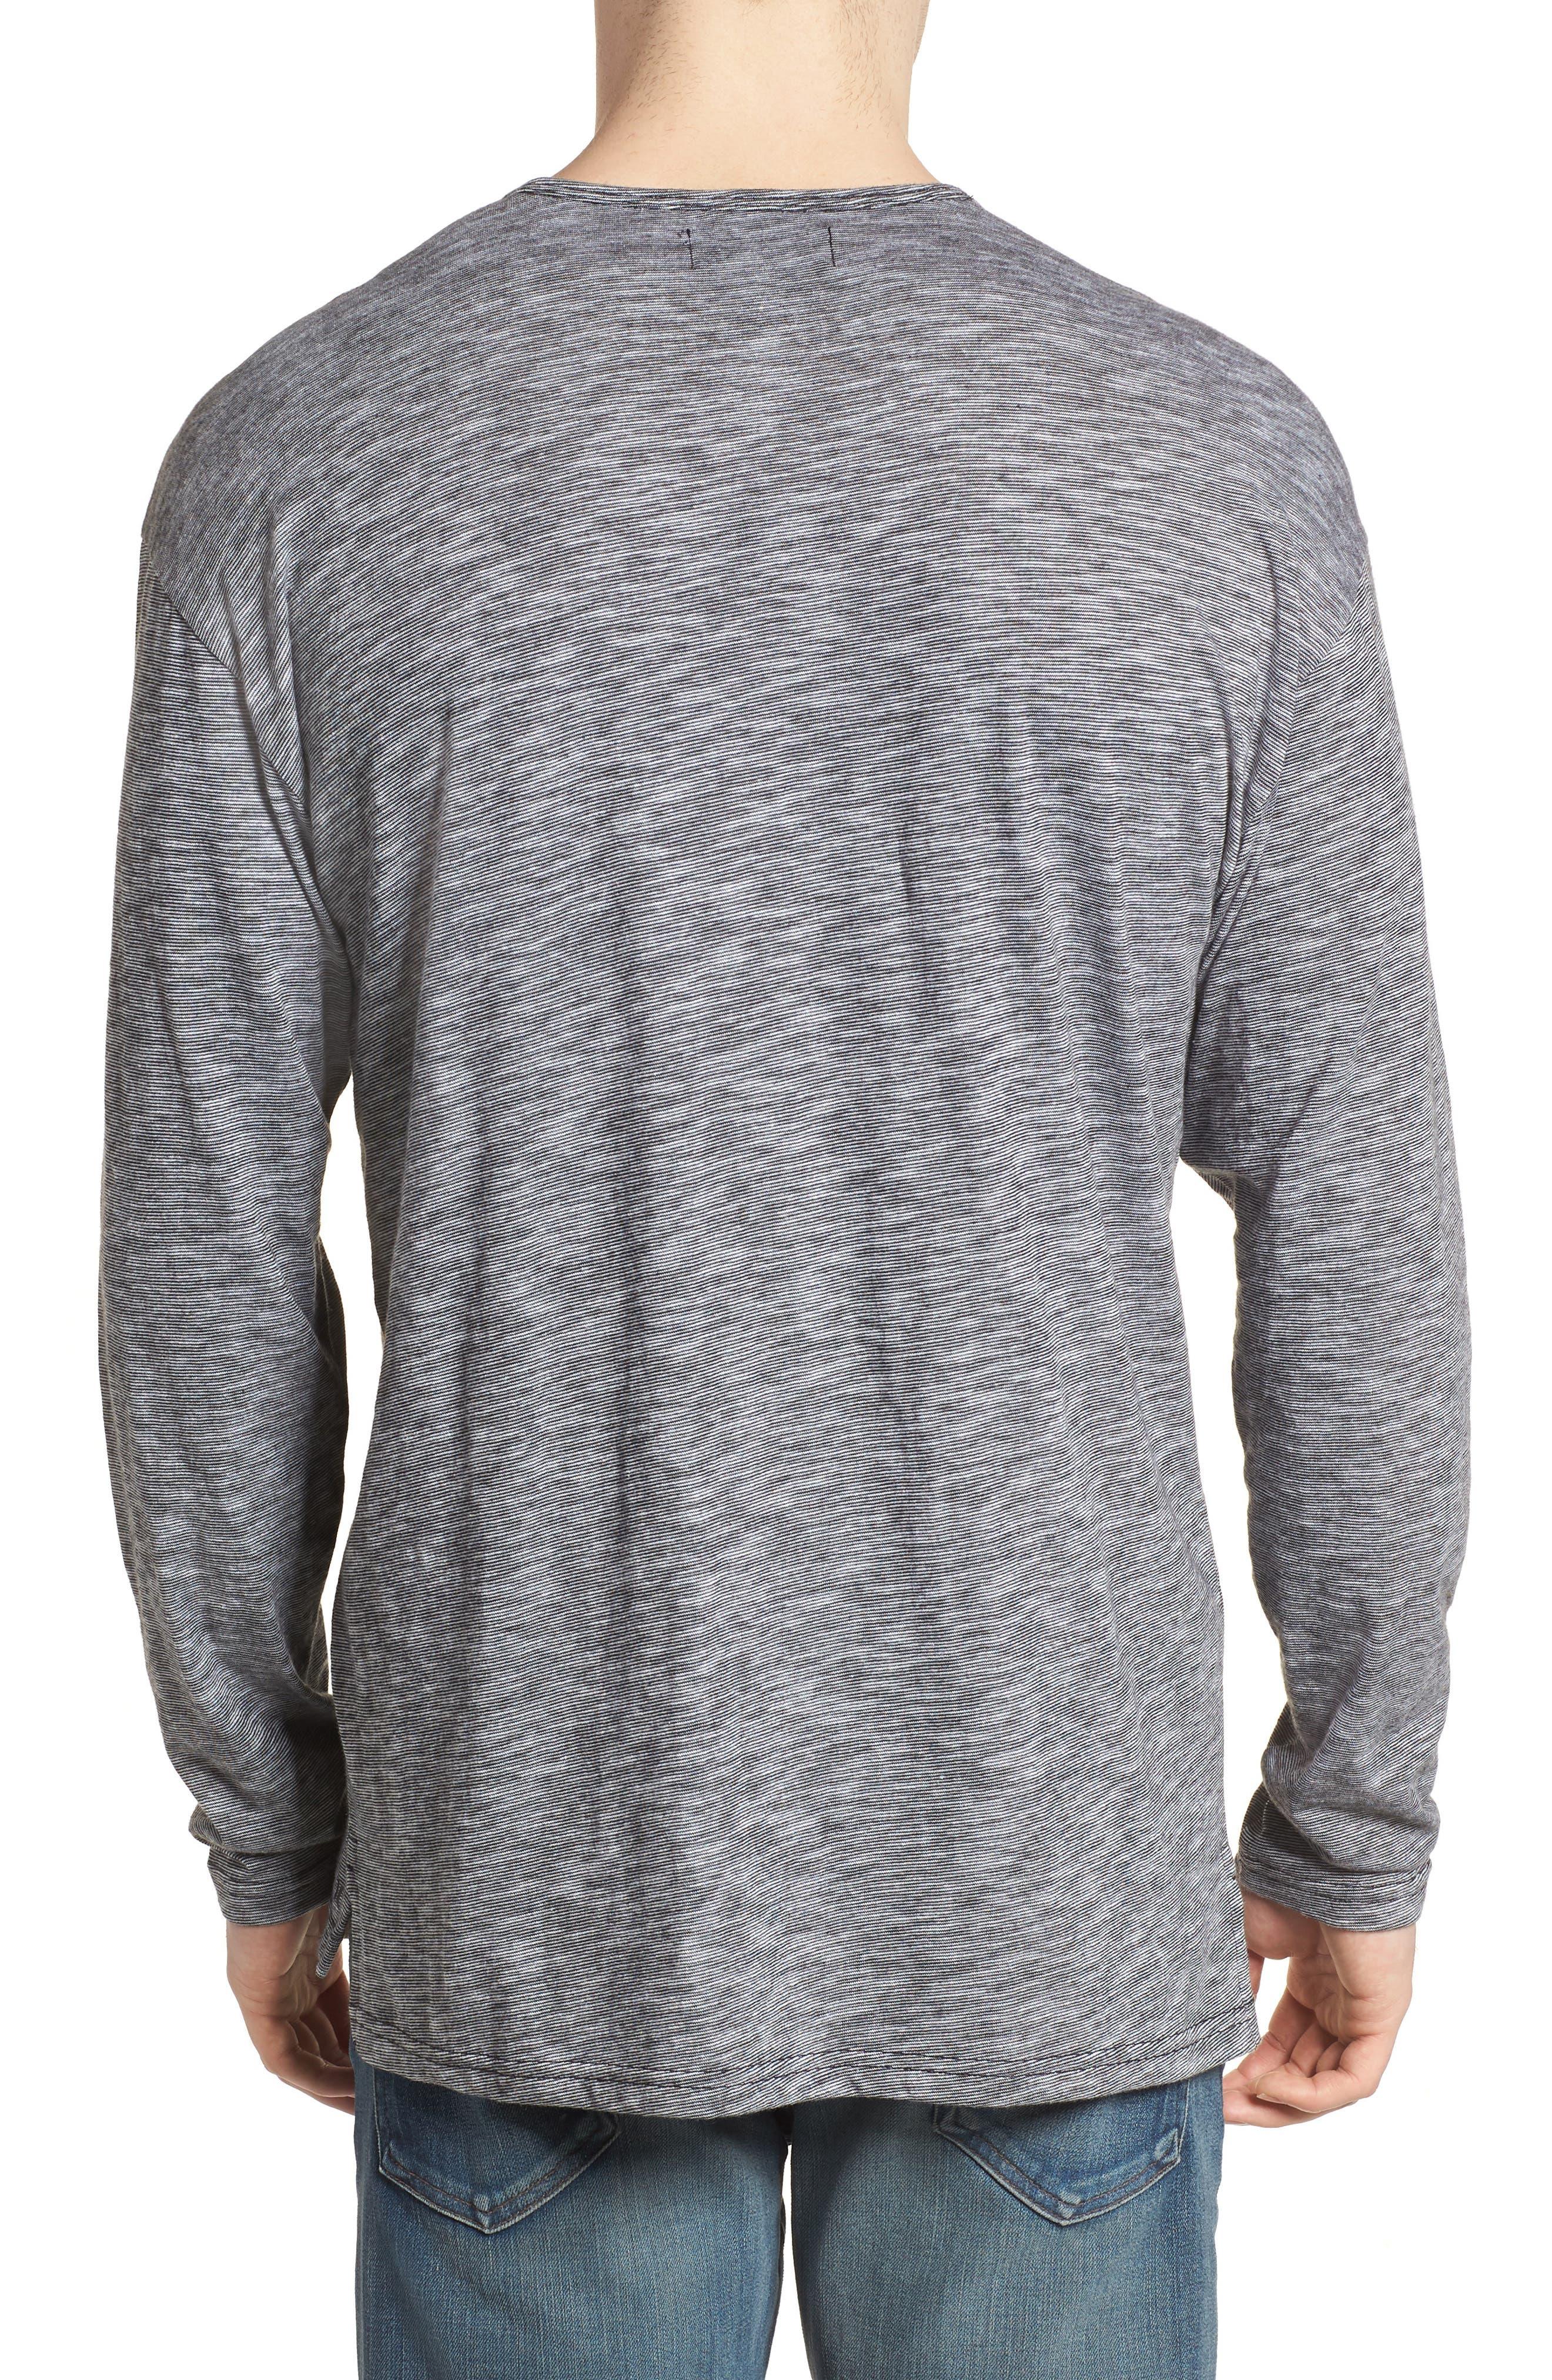 Steady Pocket T-Shirt,                             Alternate thumbnail 2, color,                             010